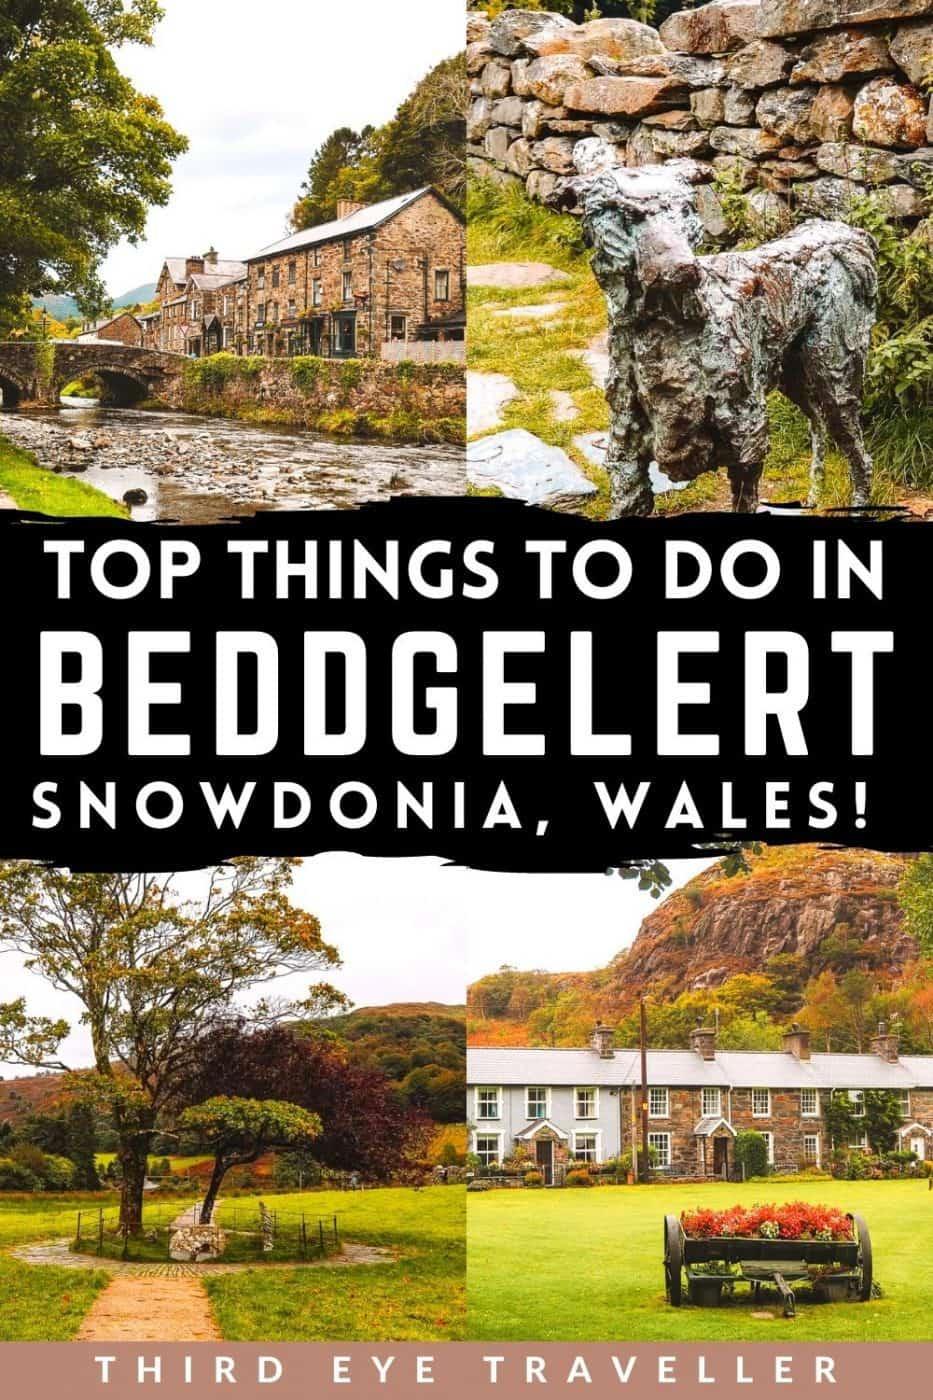 Things to do in beddgelert Wales